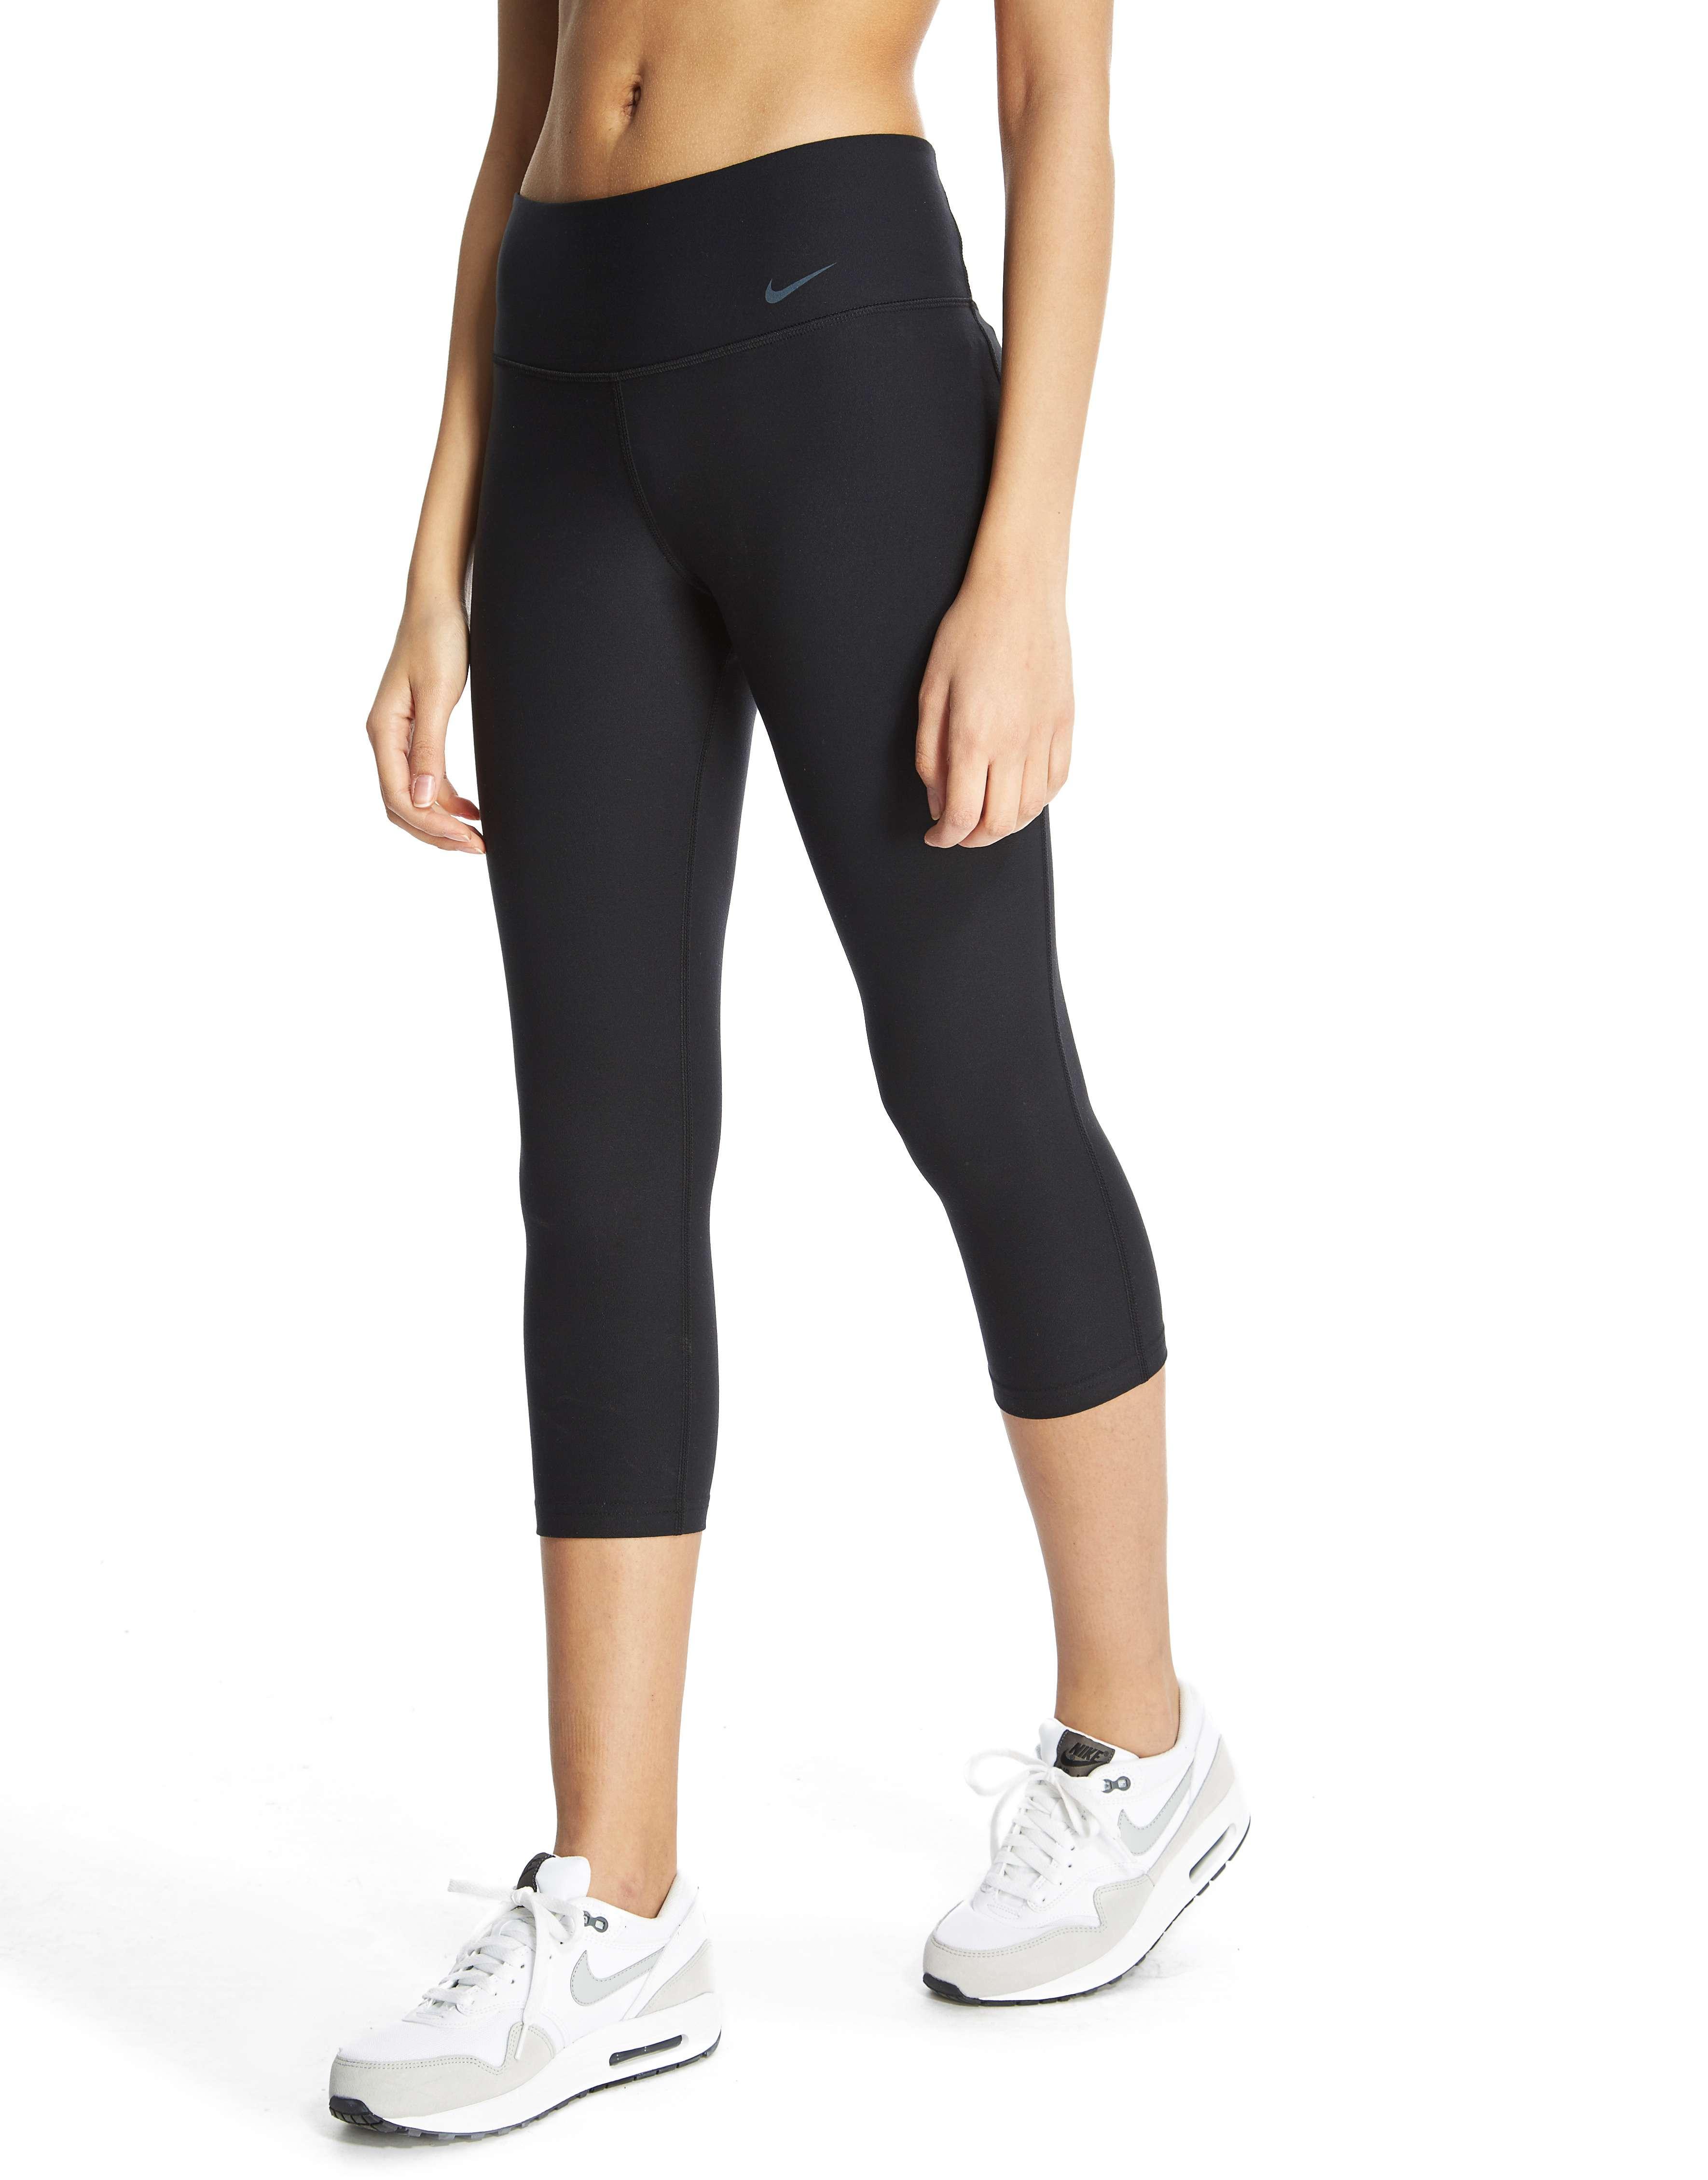 Nike Legend Capri Tights